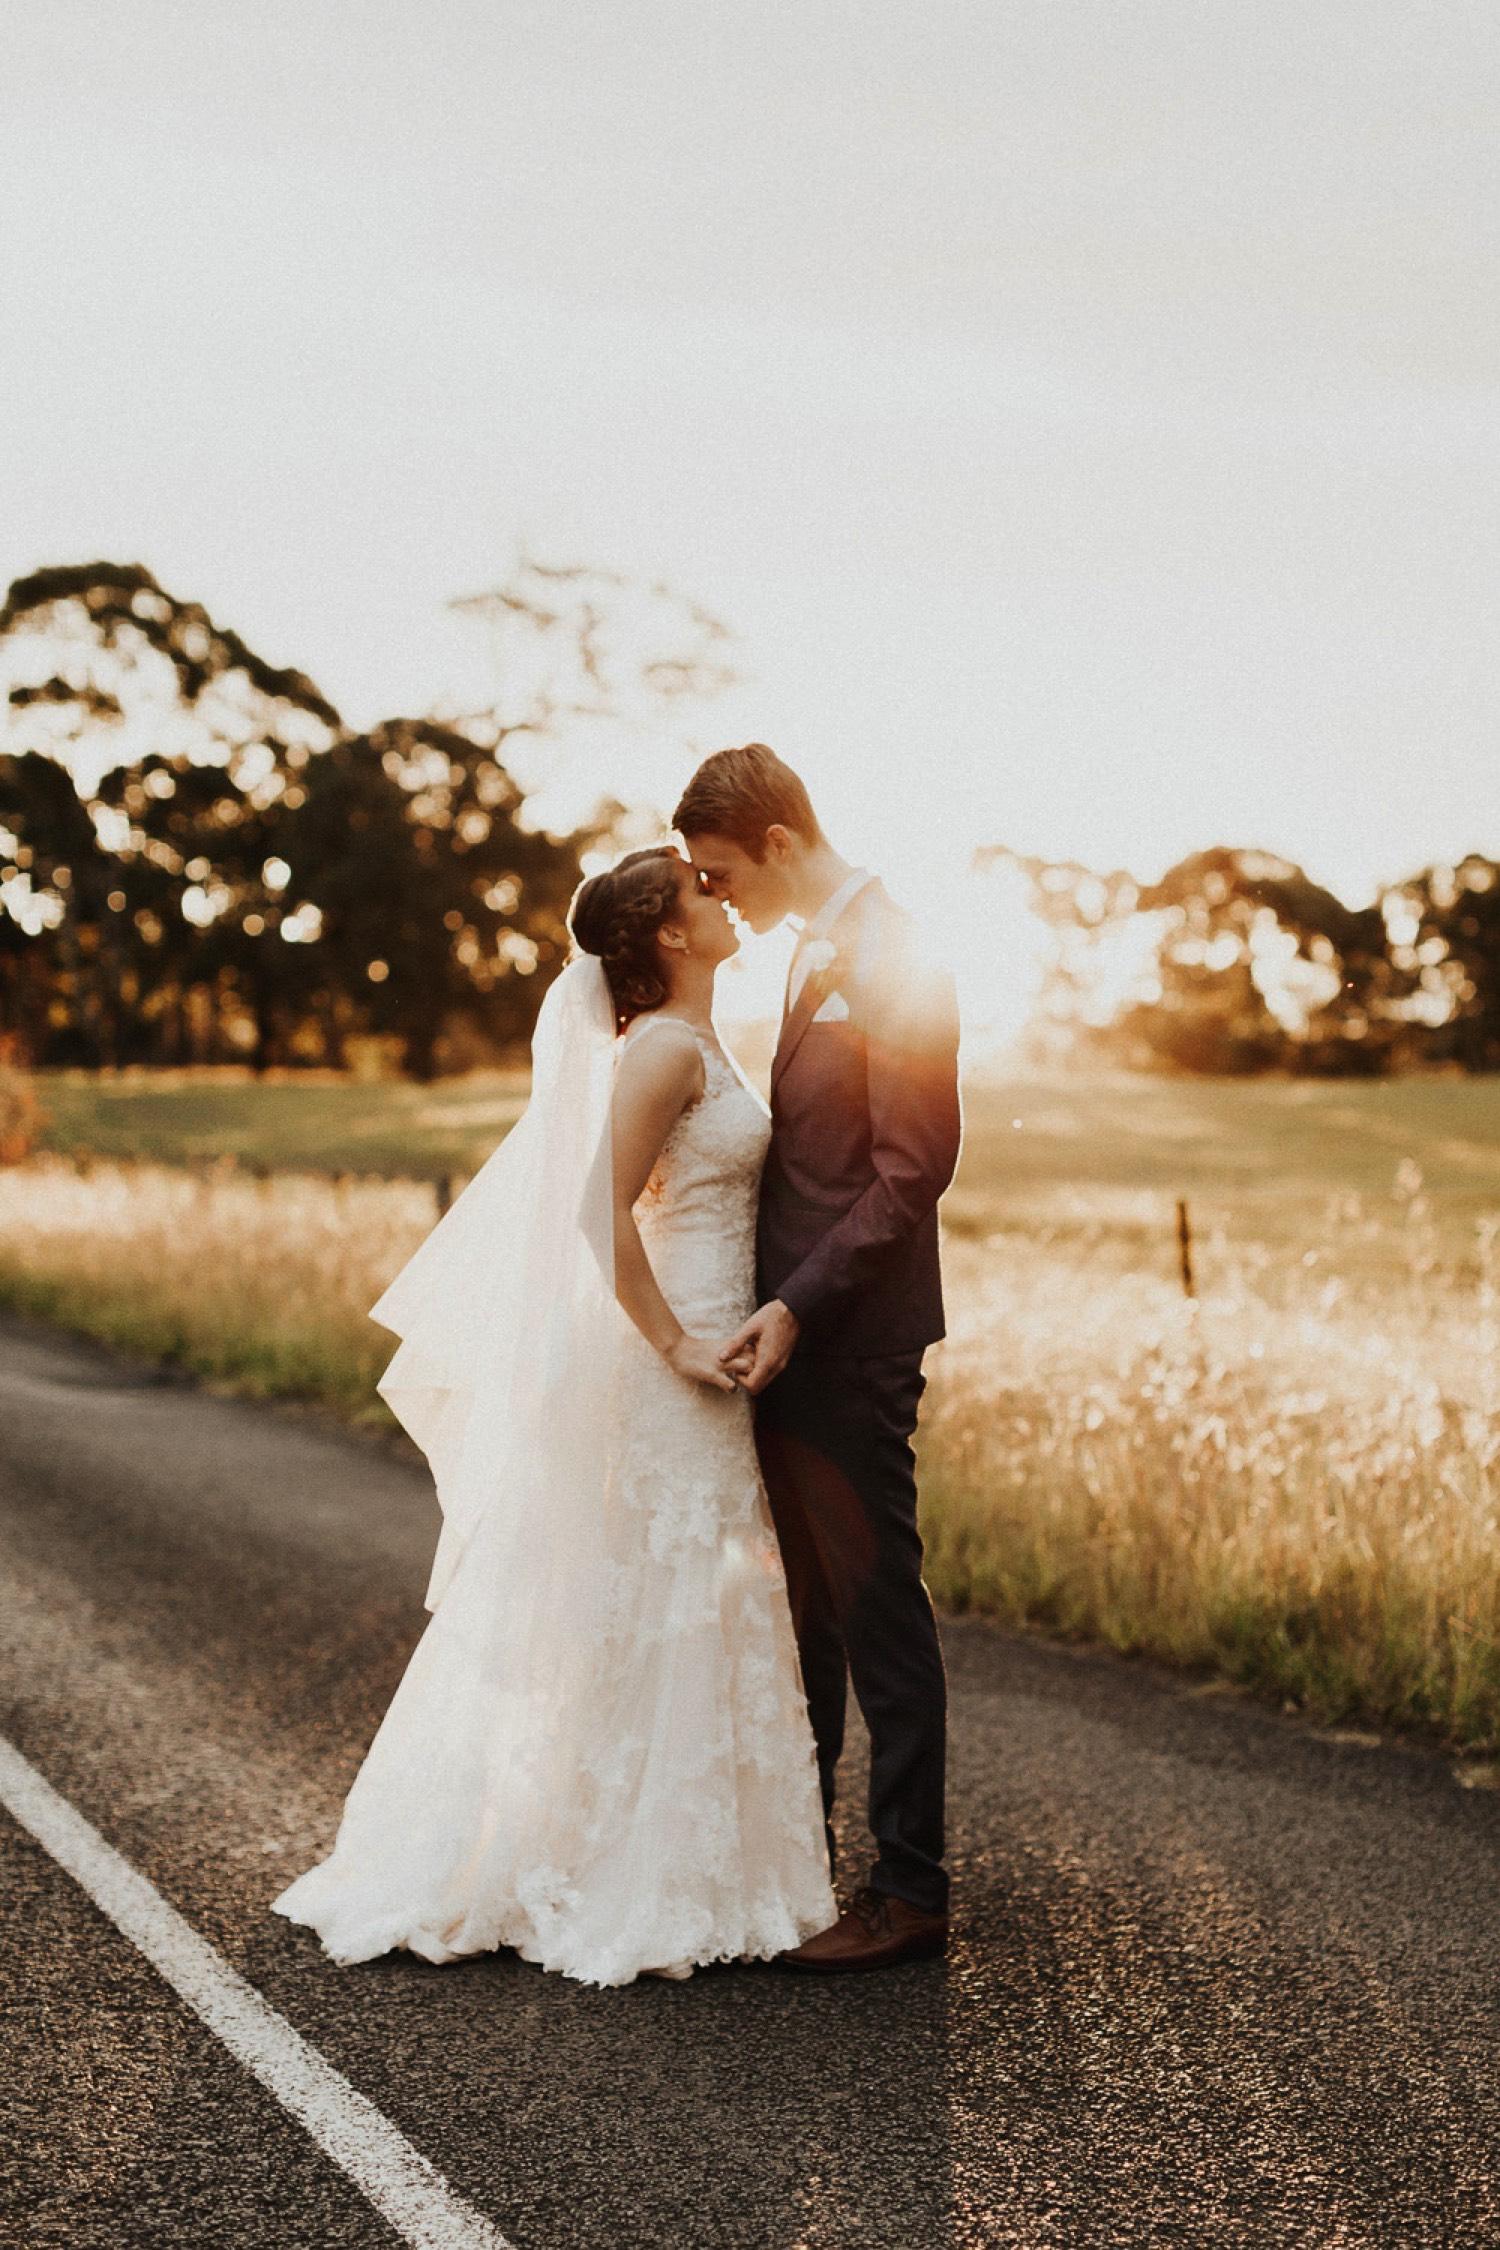 Rustic Country Wedding Photography 71.jpg